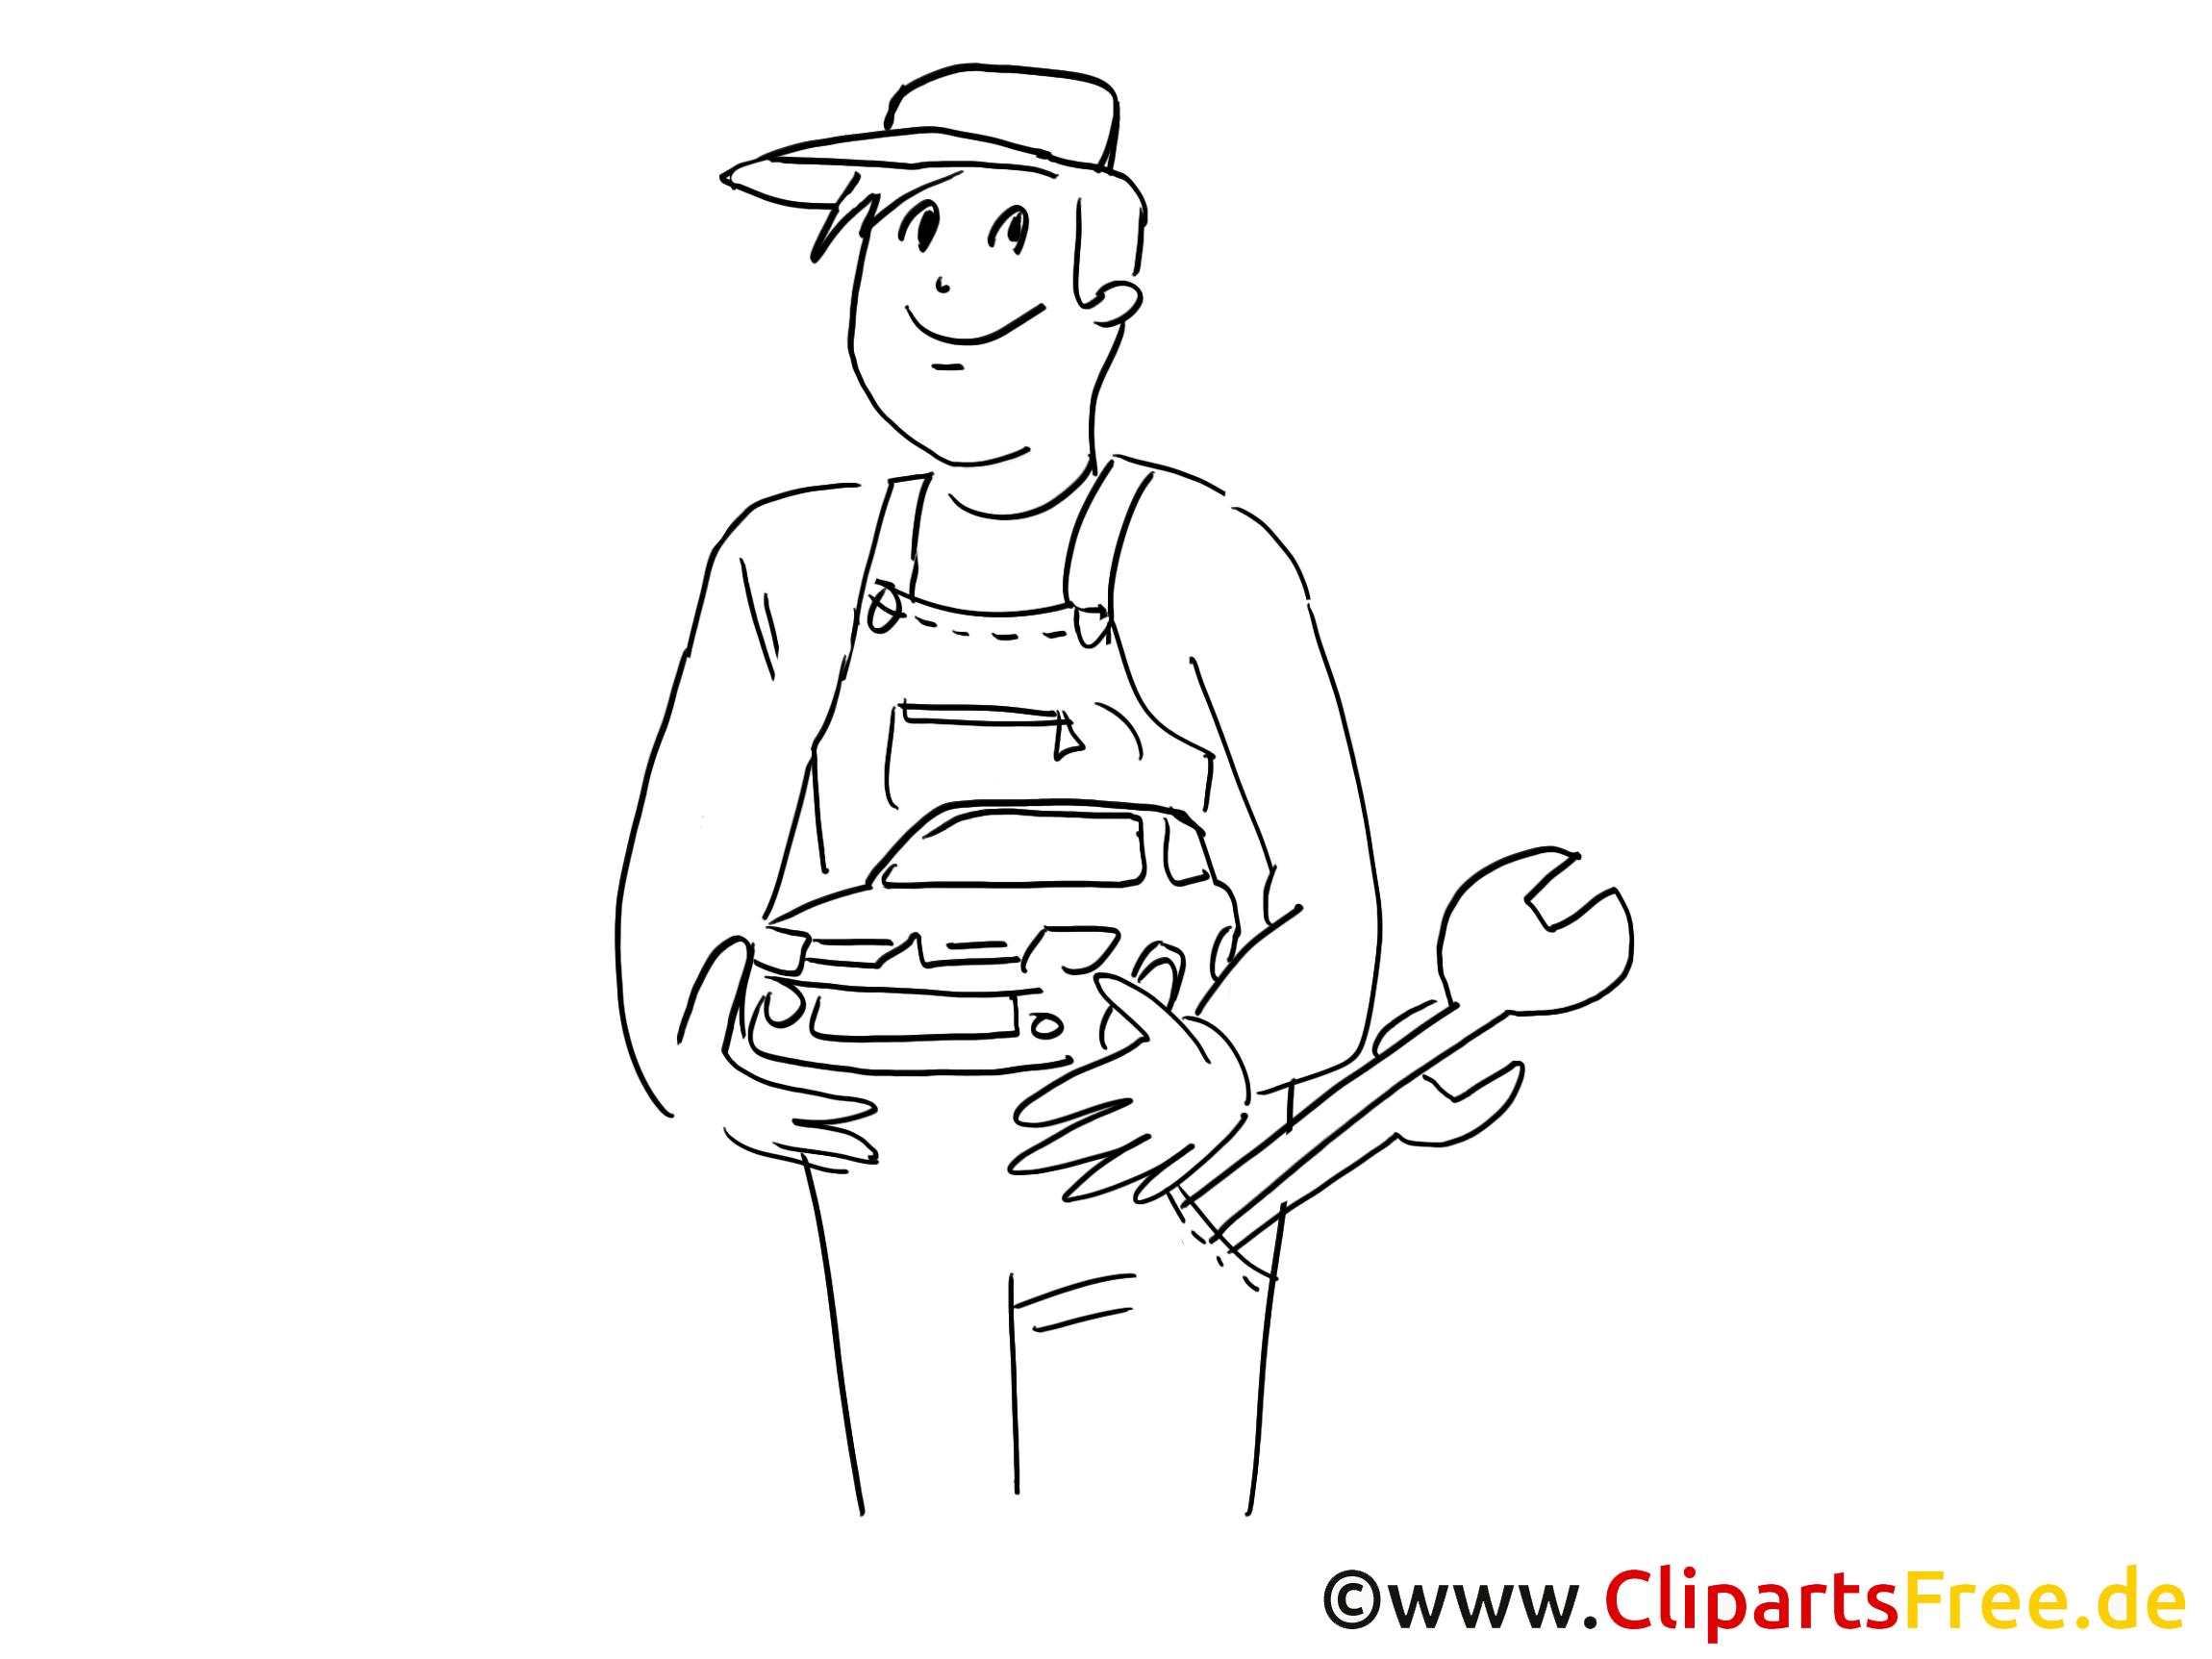 Motorcar mechanic clip art, graphic, pic, cartoon, comic free